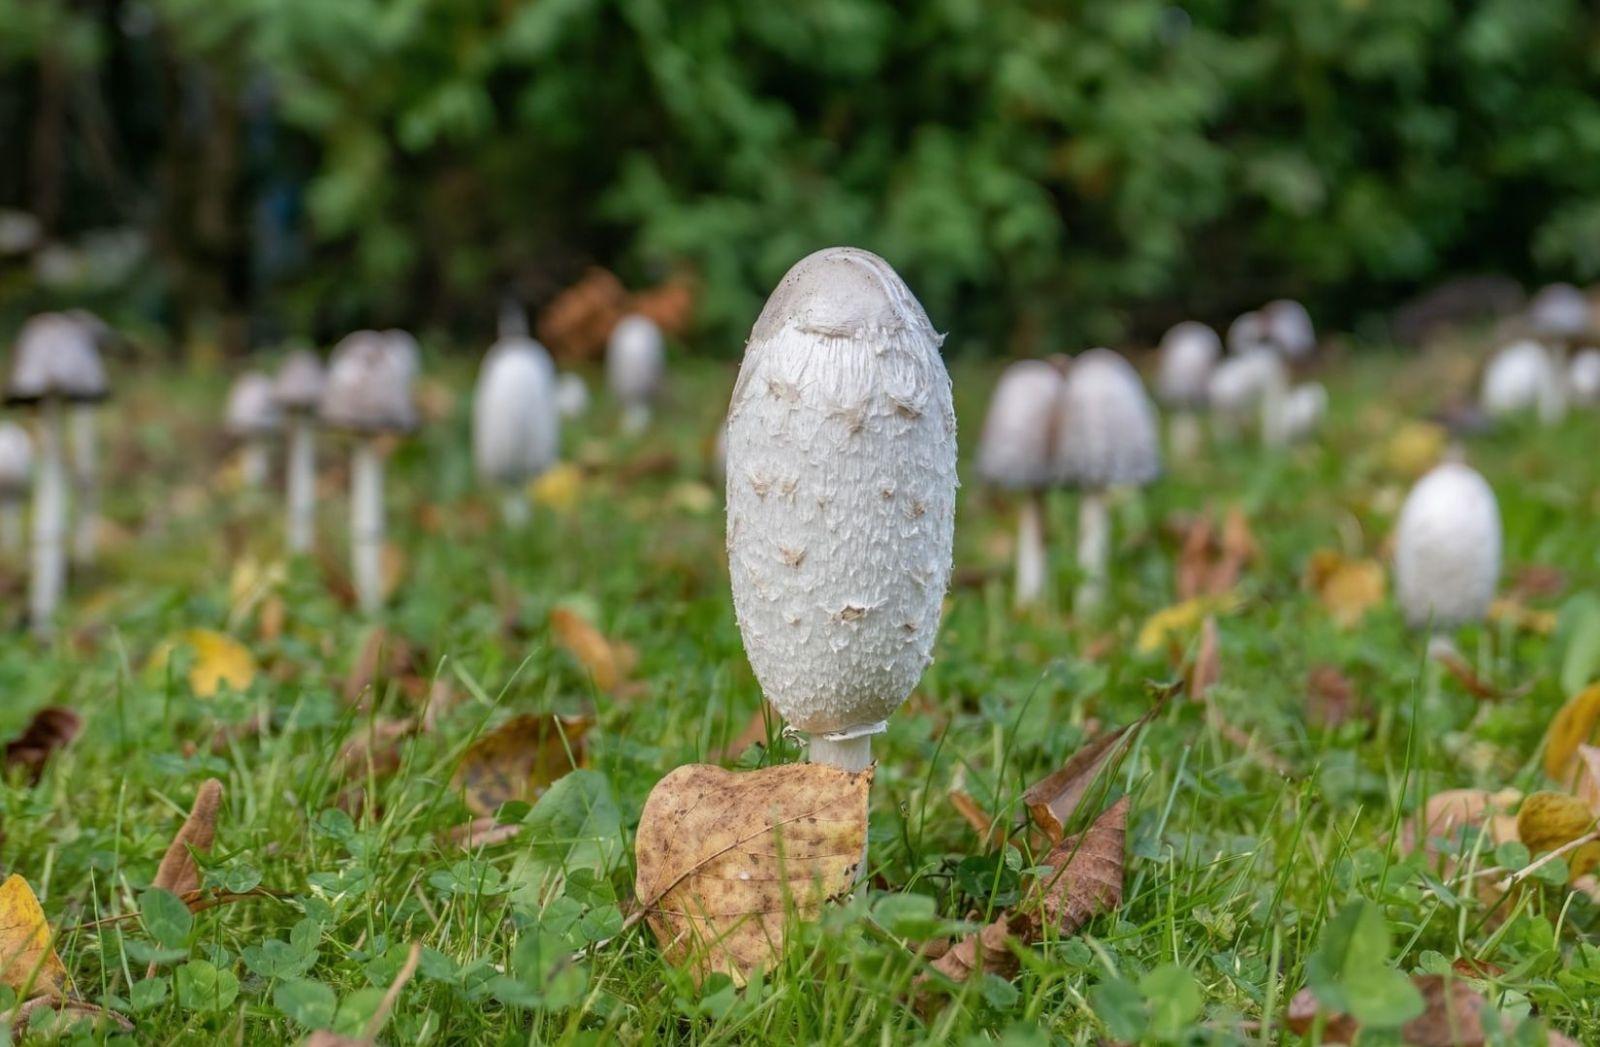 Pilze im Wald. (Foto: Sangga Rima Roman Selia, Unsplash.com)